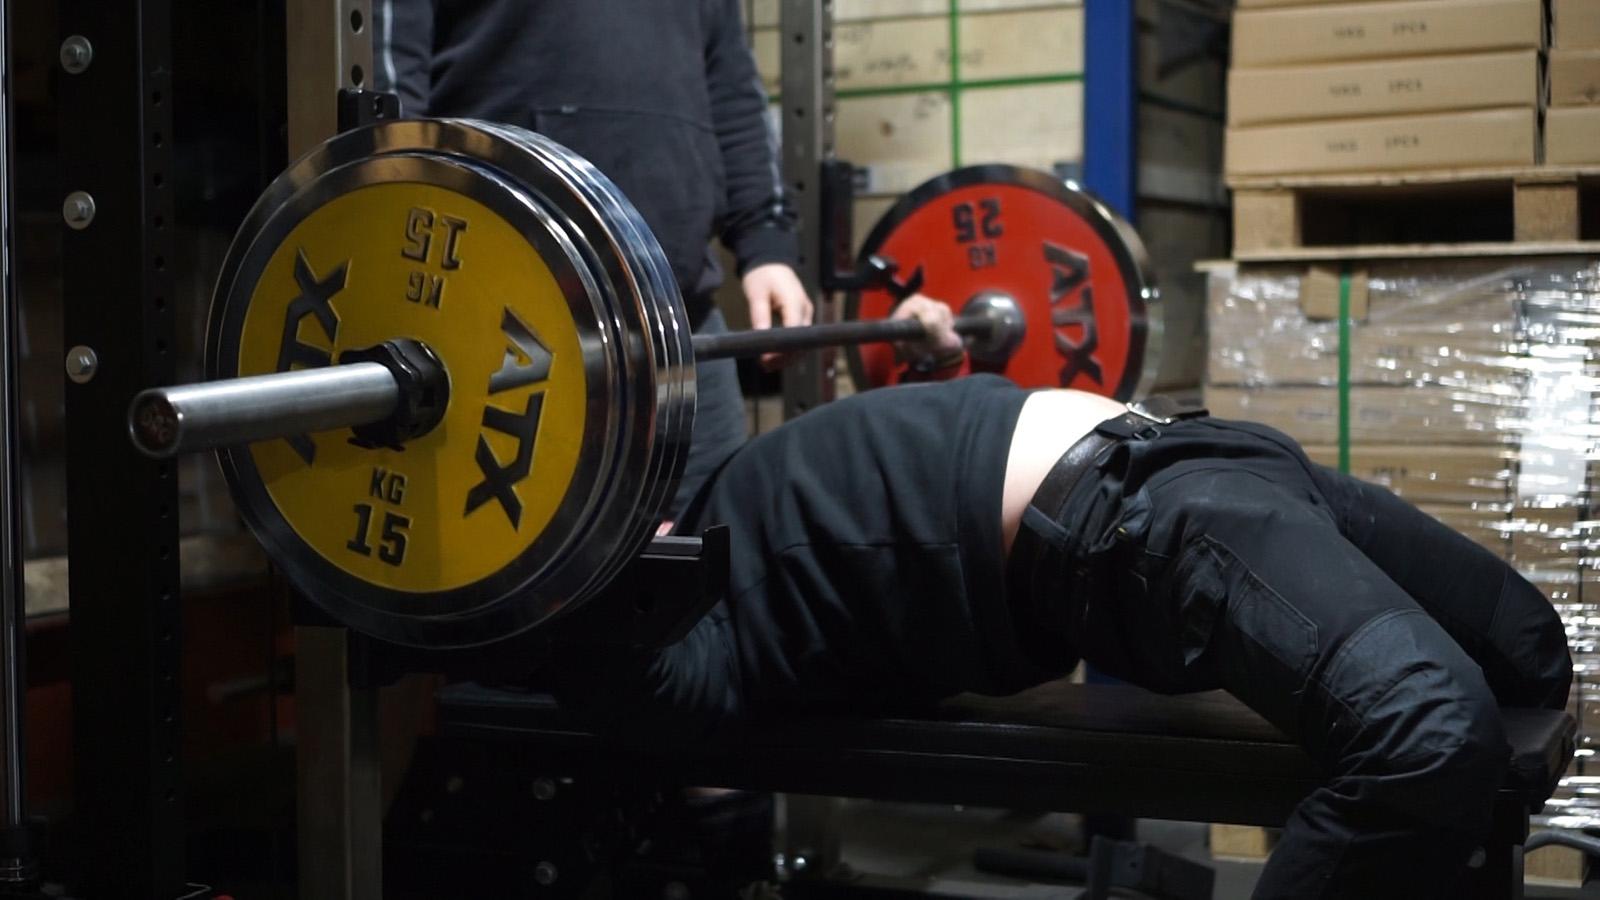 190 kg bench press